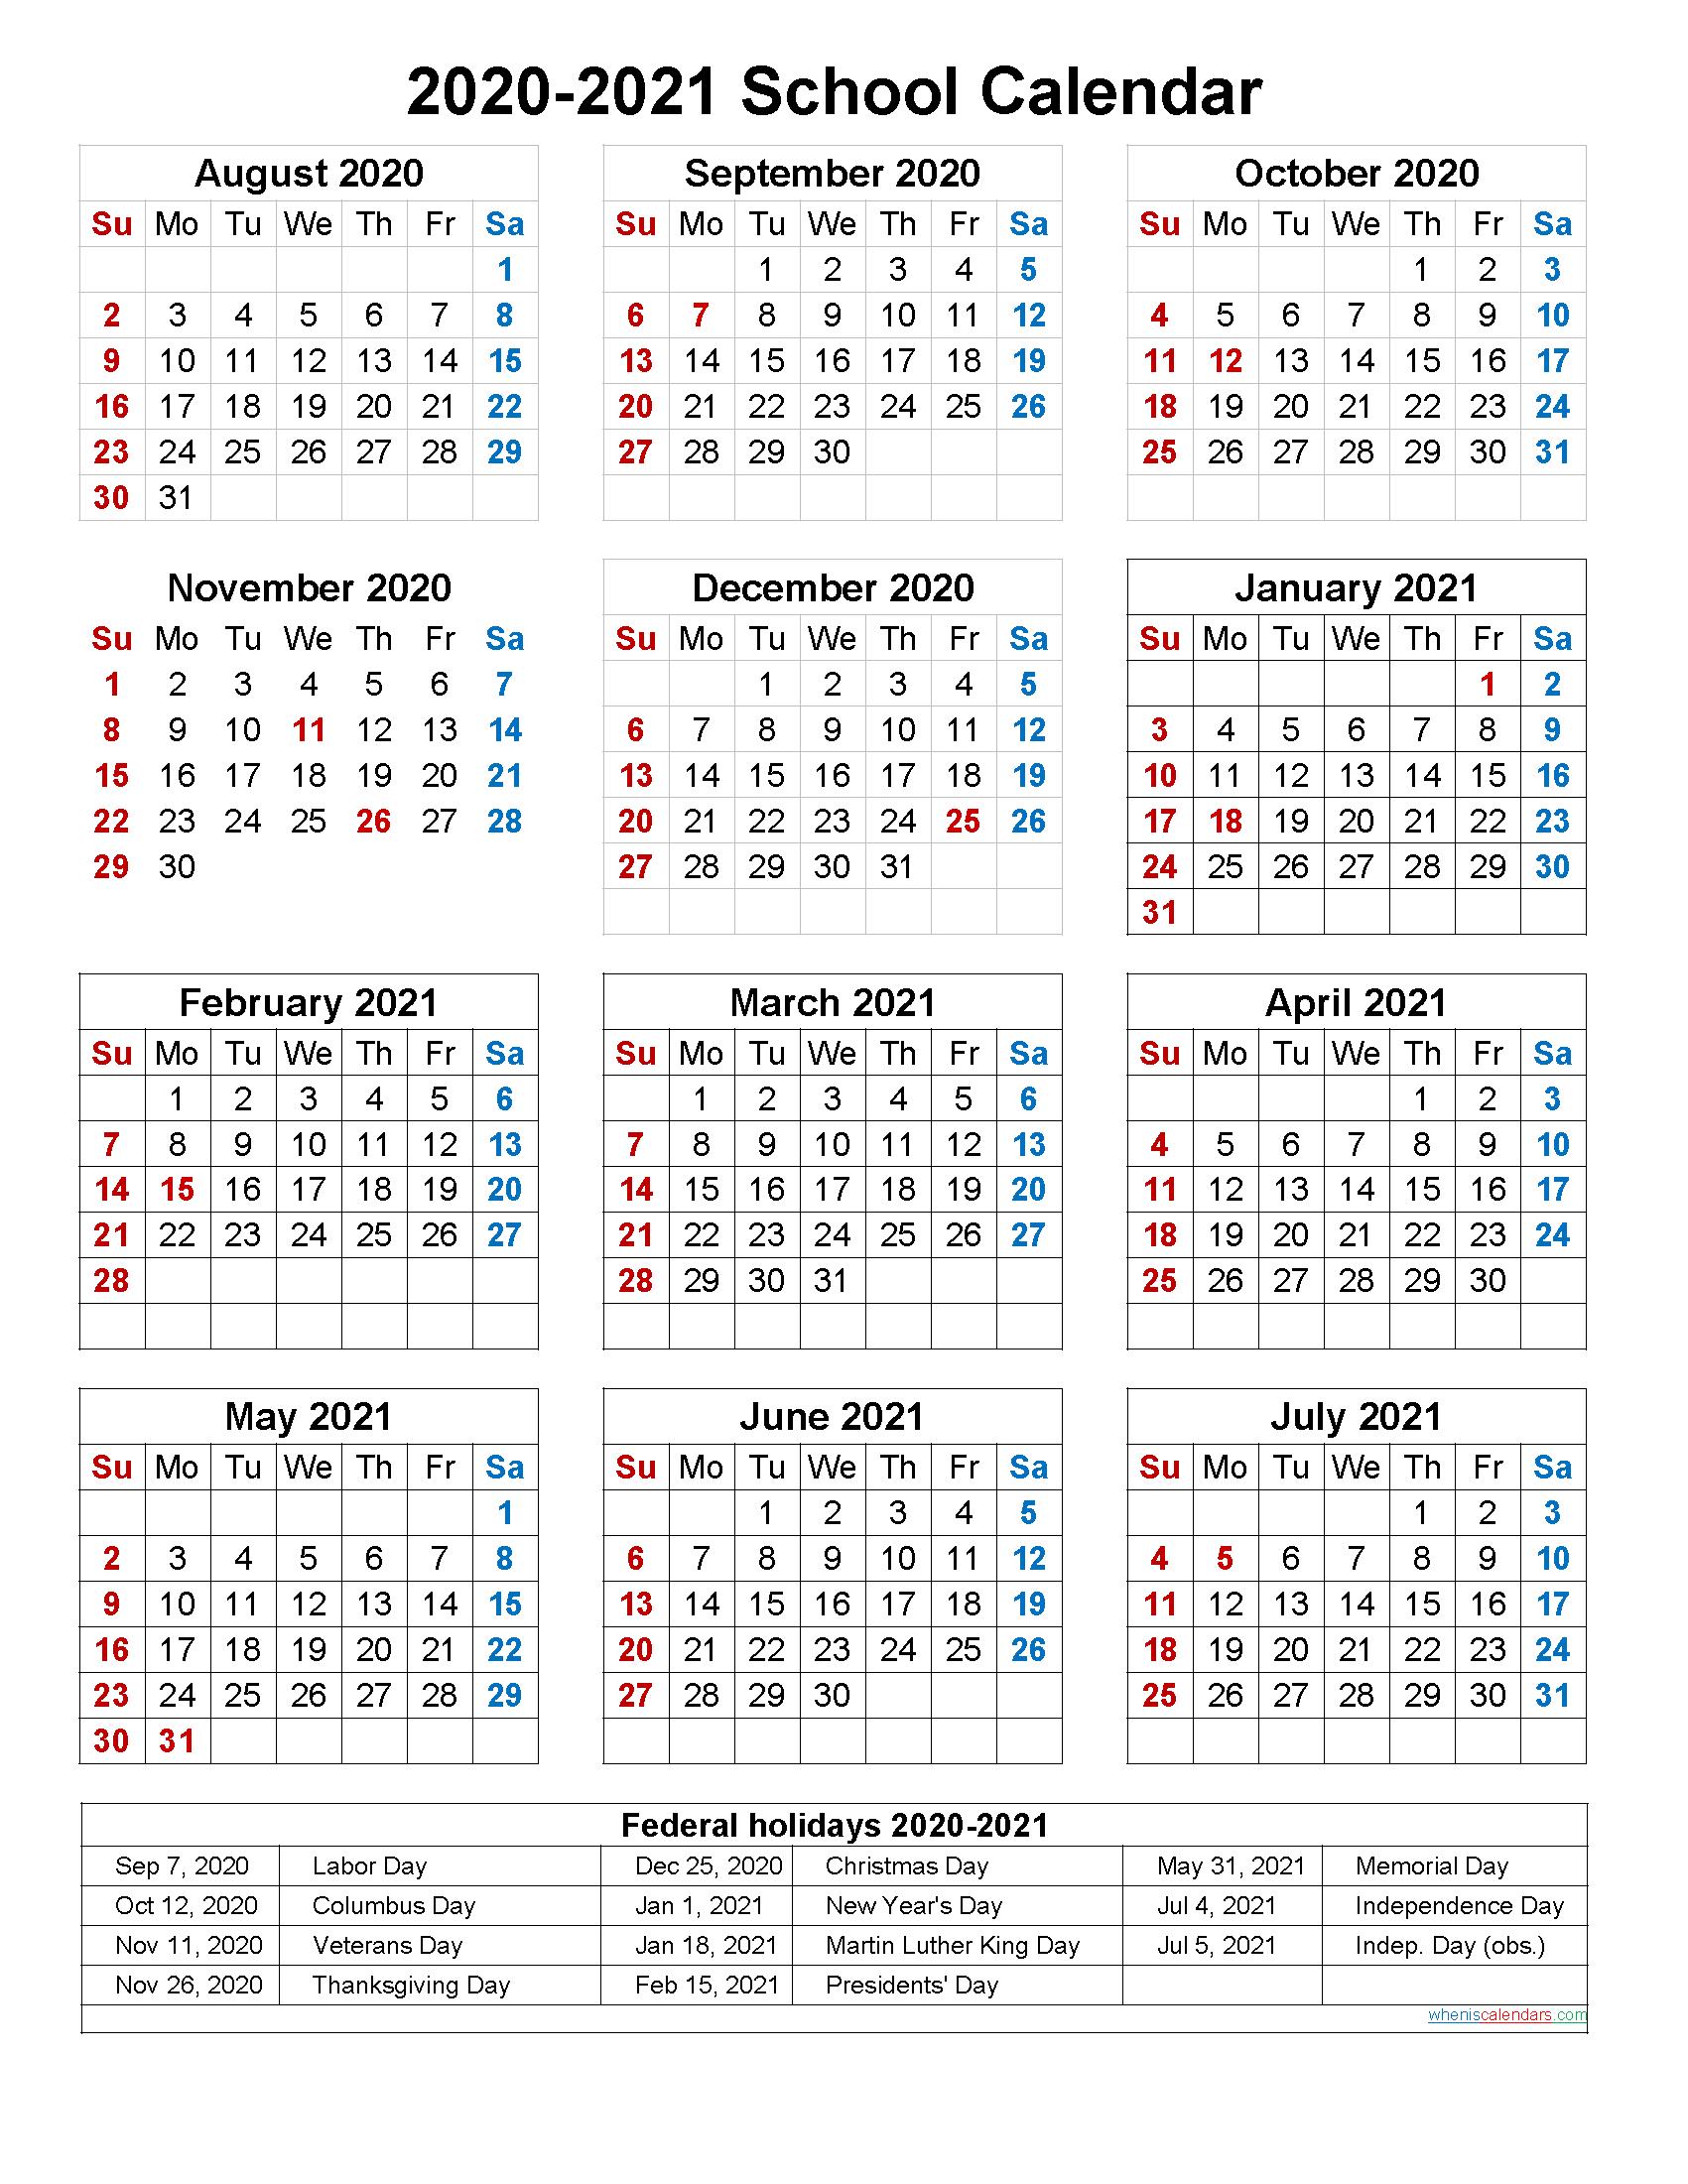 Mcps Calendar 2021 2022 - February 2021